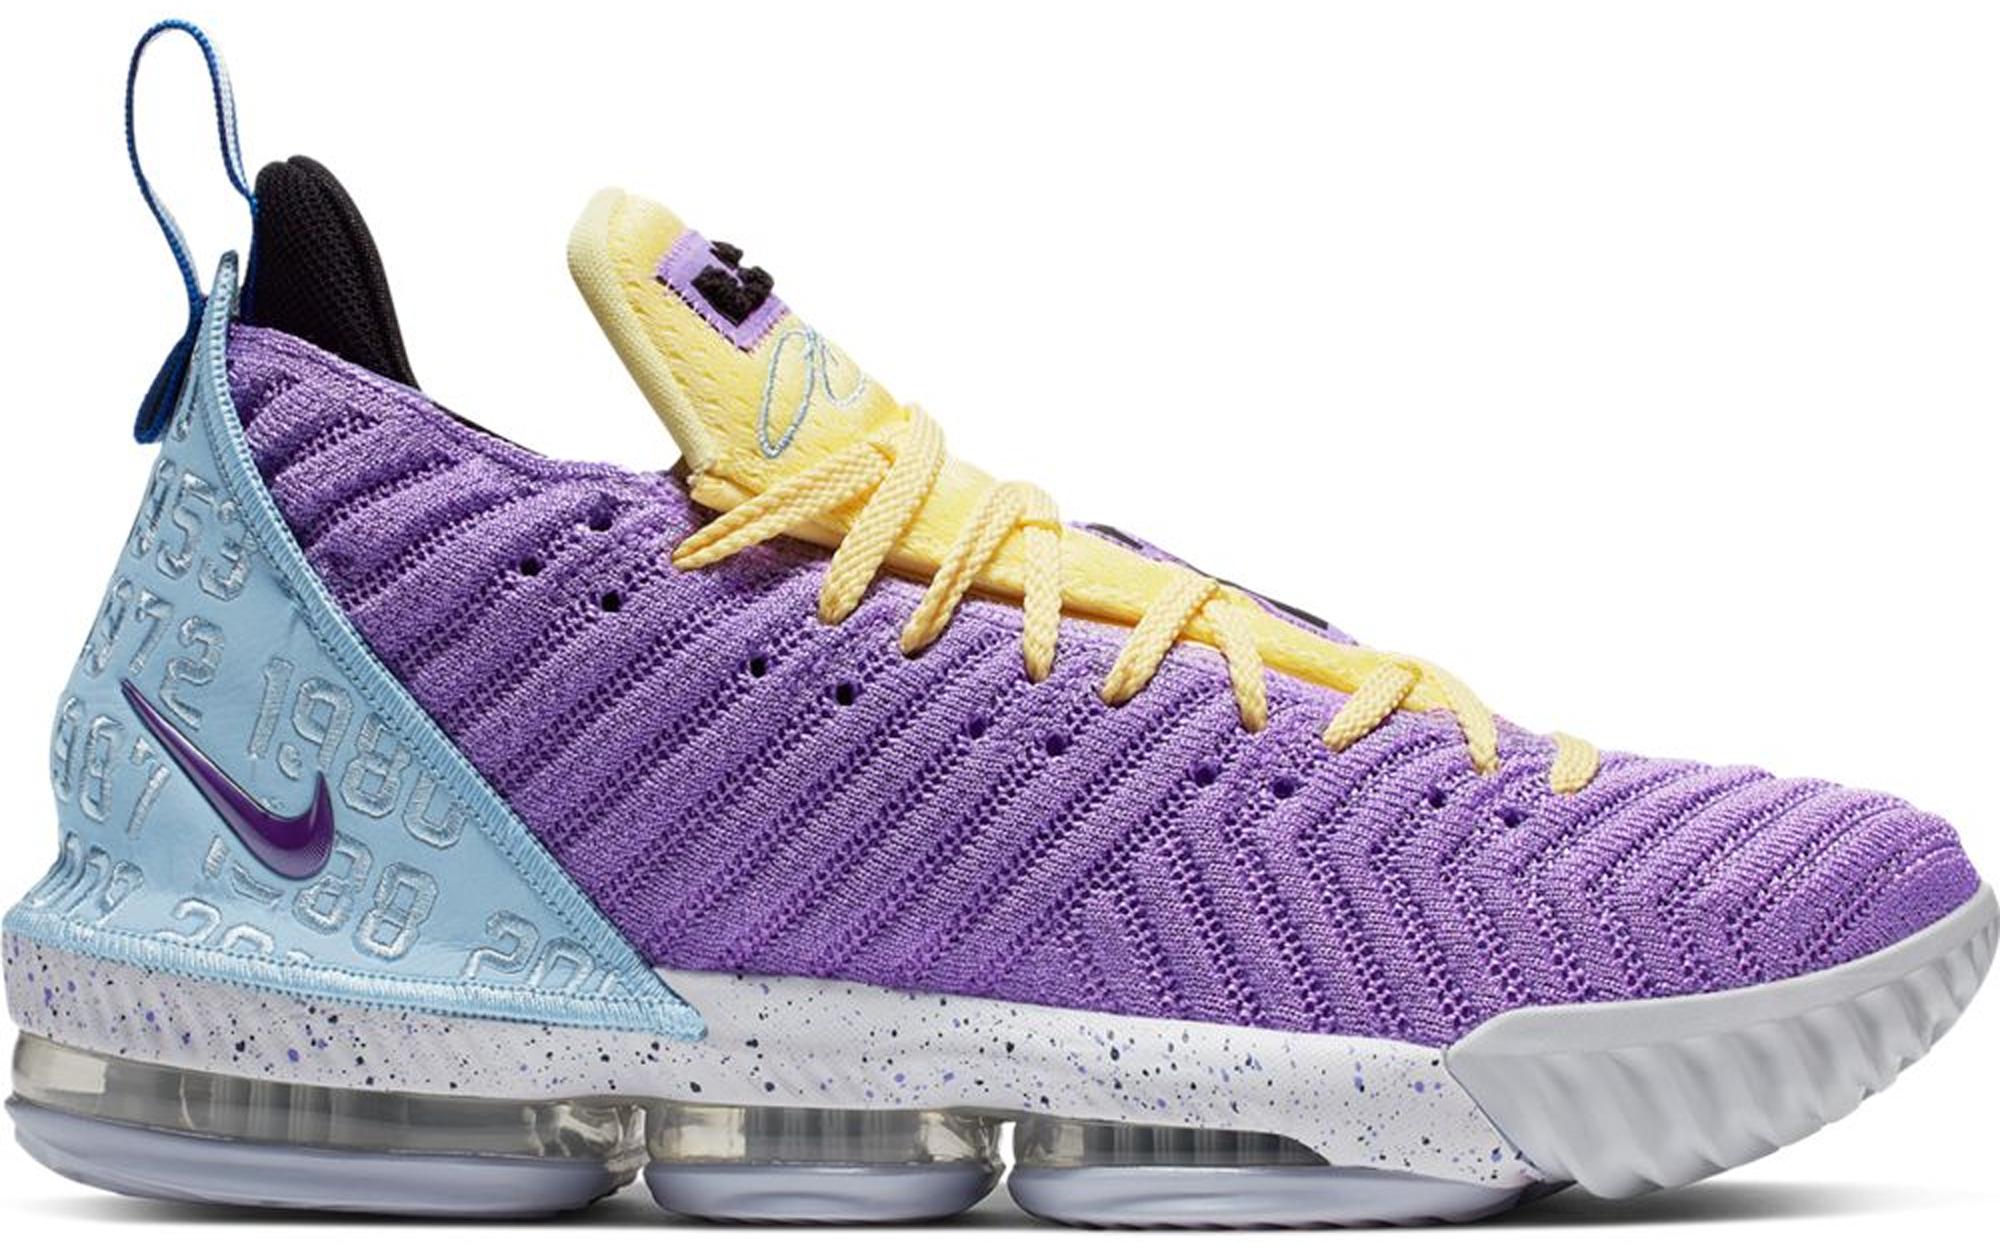 Nike LeBron 16 Lakers Championships